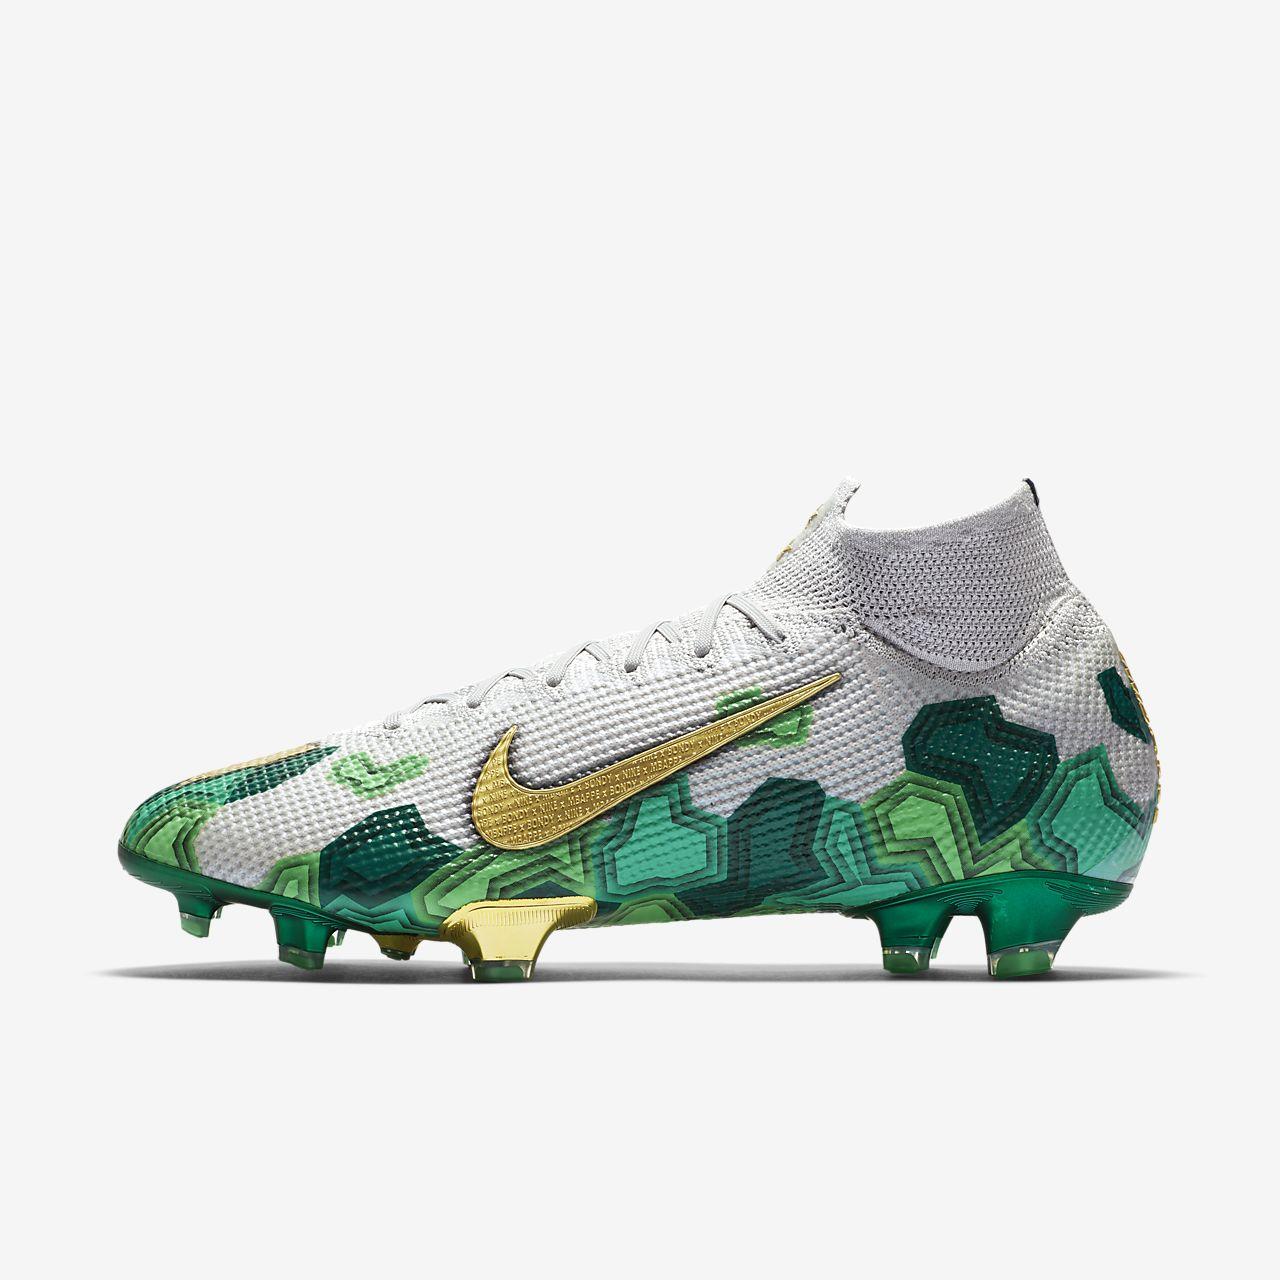 Nike Mercurial Superfly My Soccer Australia